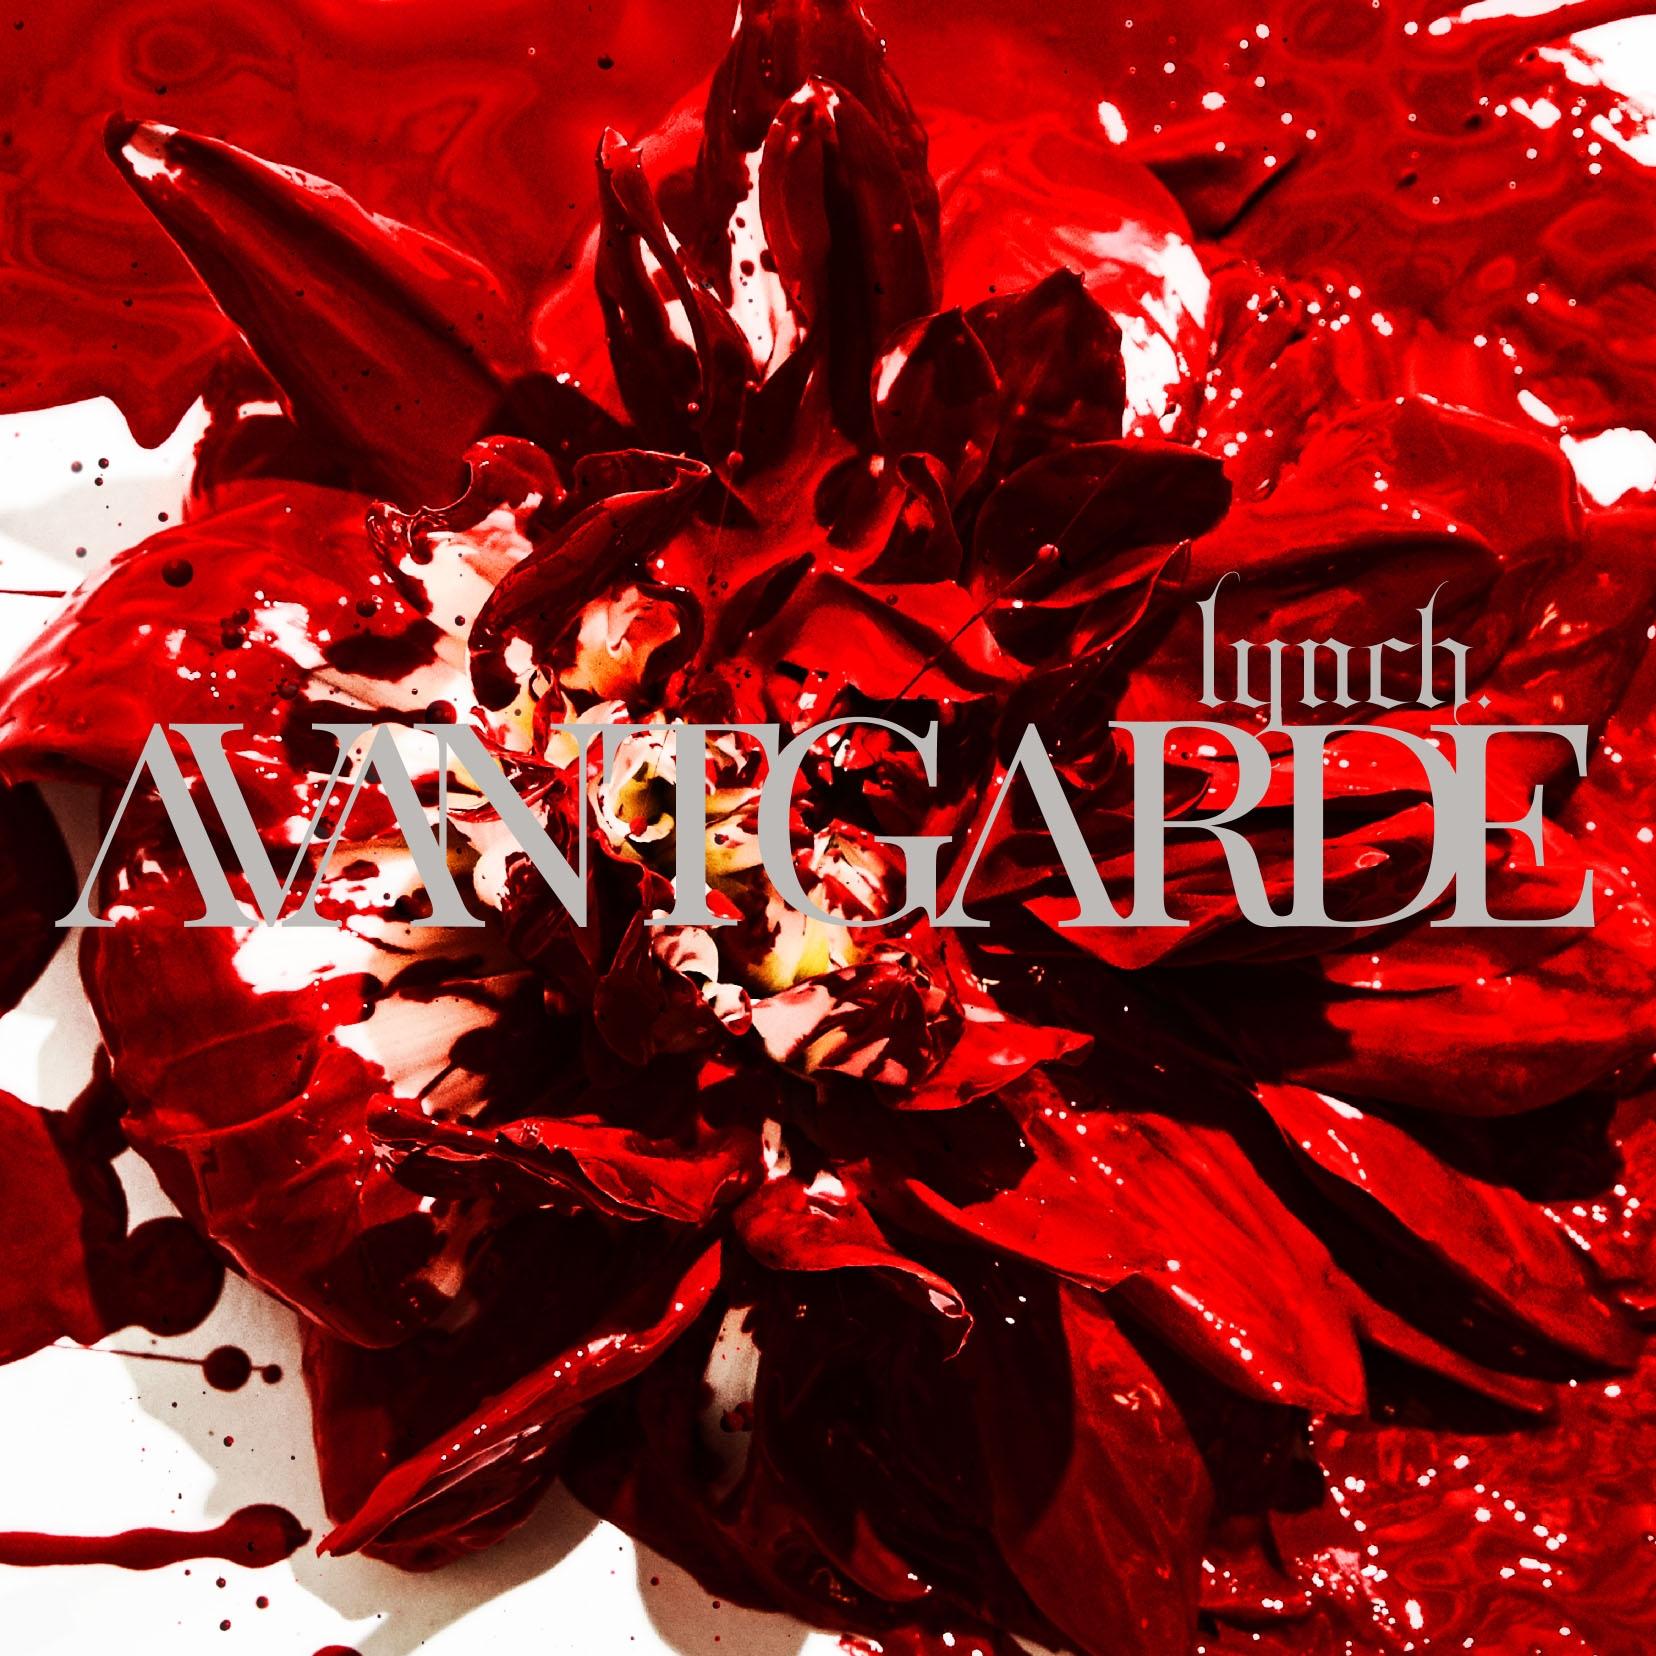 lynch-avantgarde-artwork